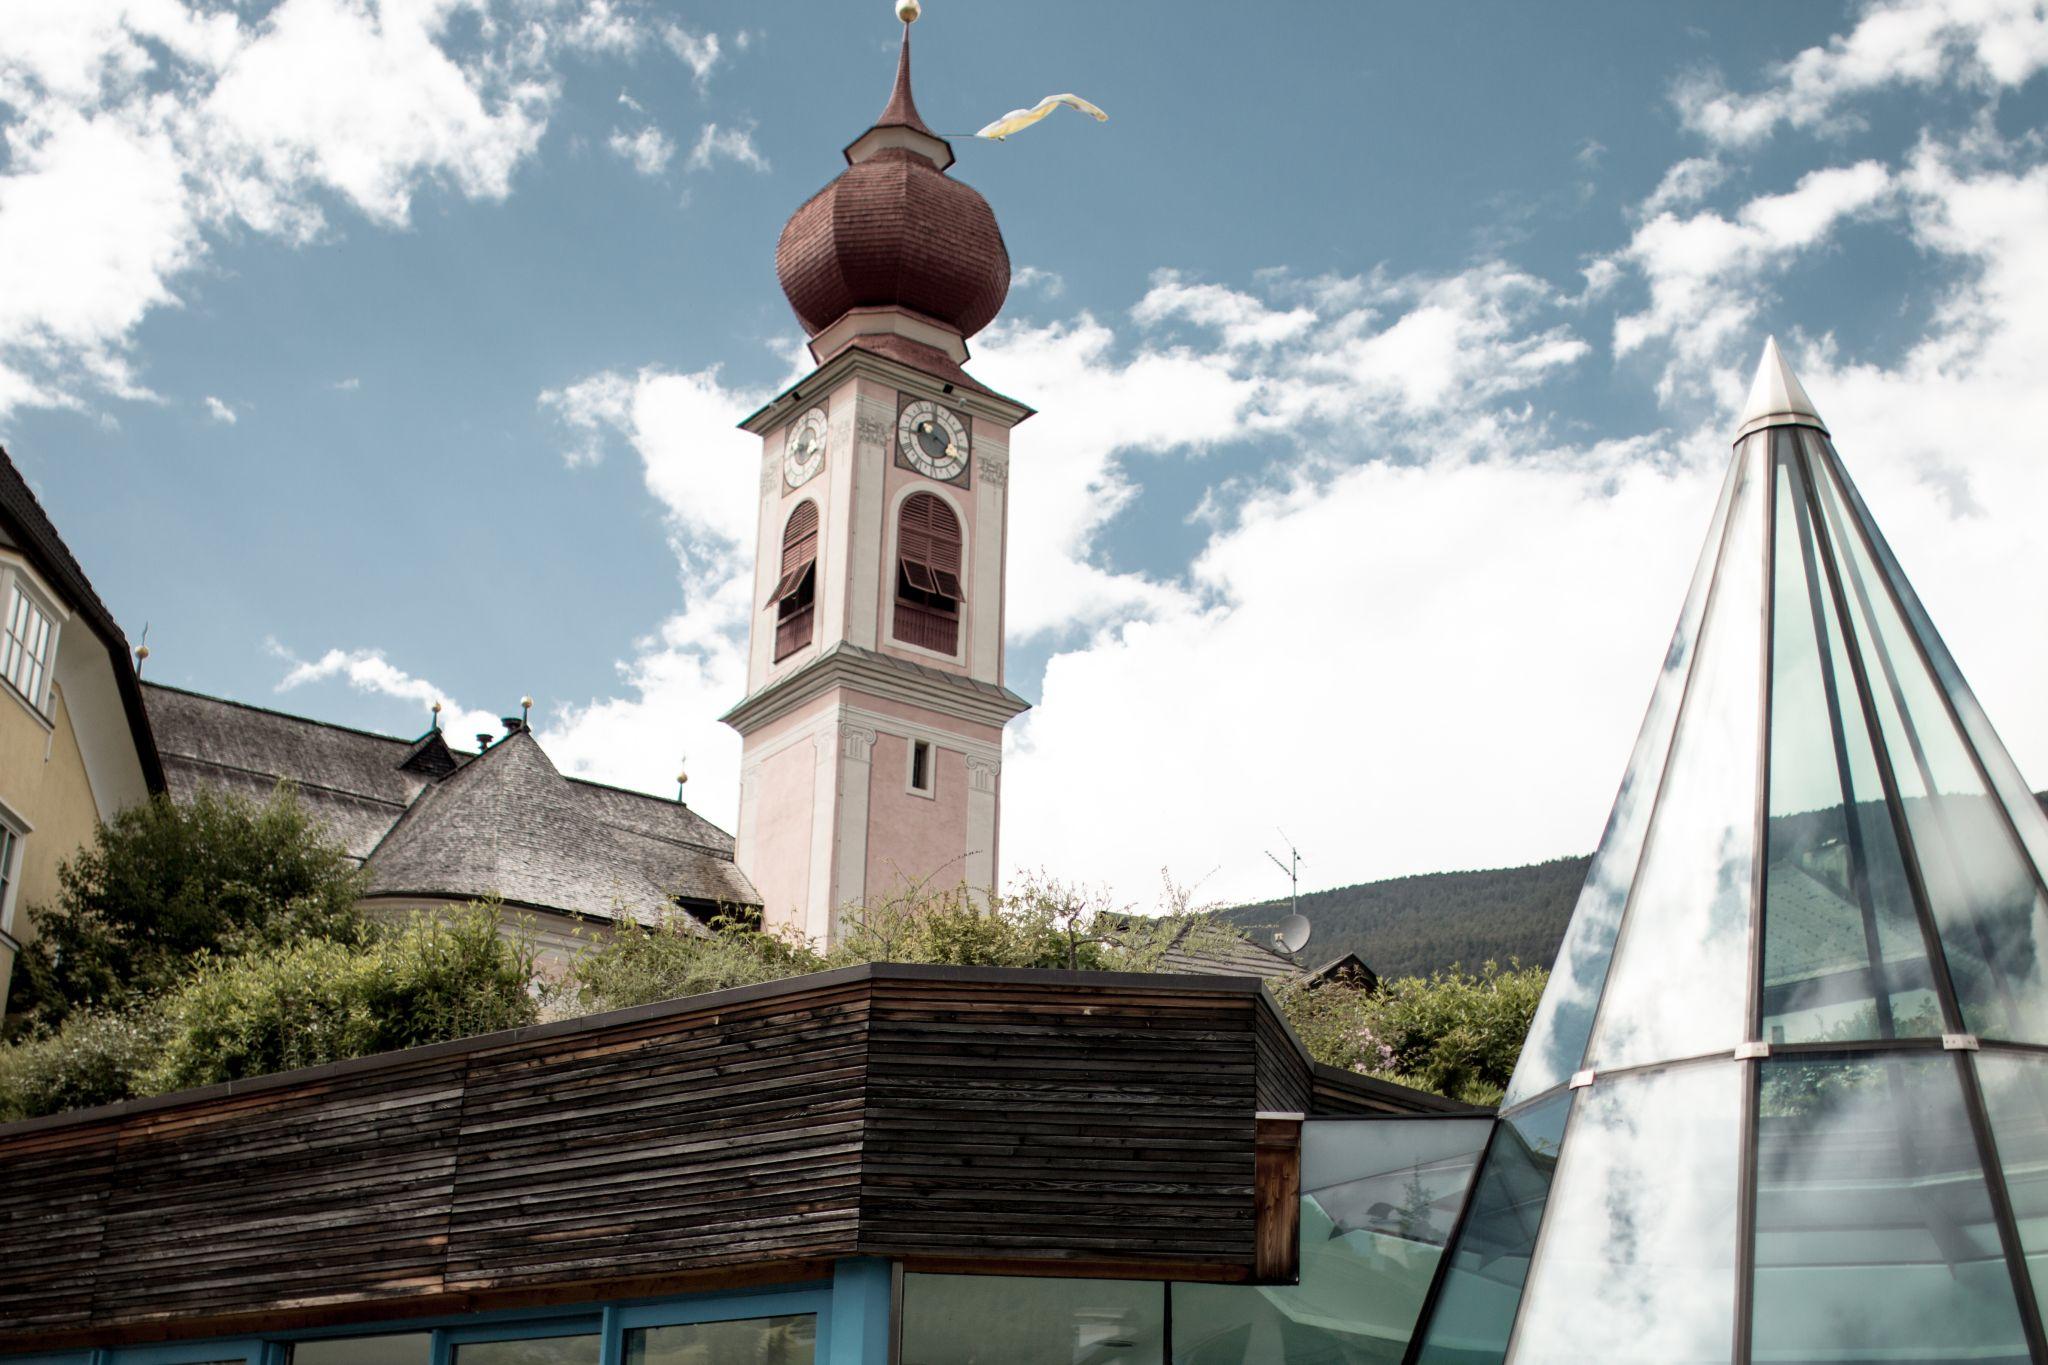 Adler Dolomites Ortisei Italy Hotel Review Exterior Pool